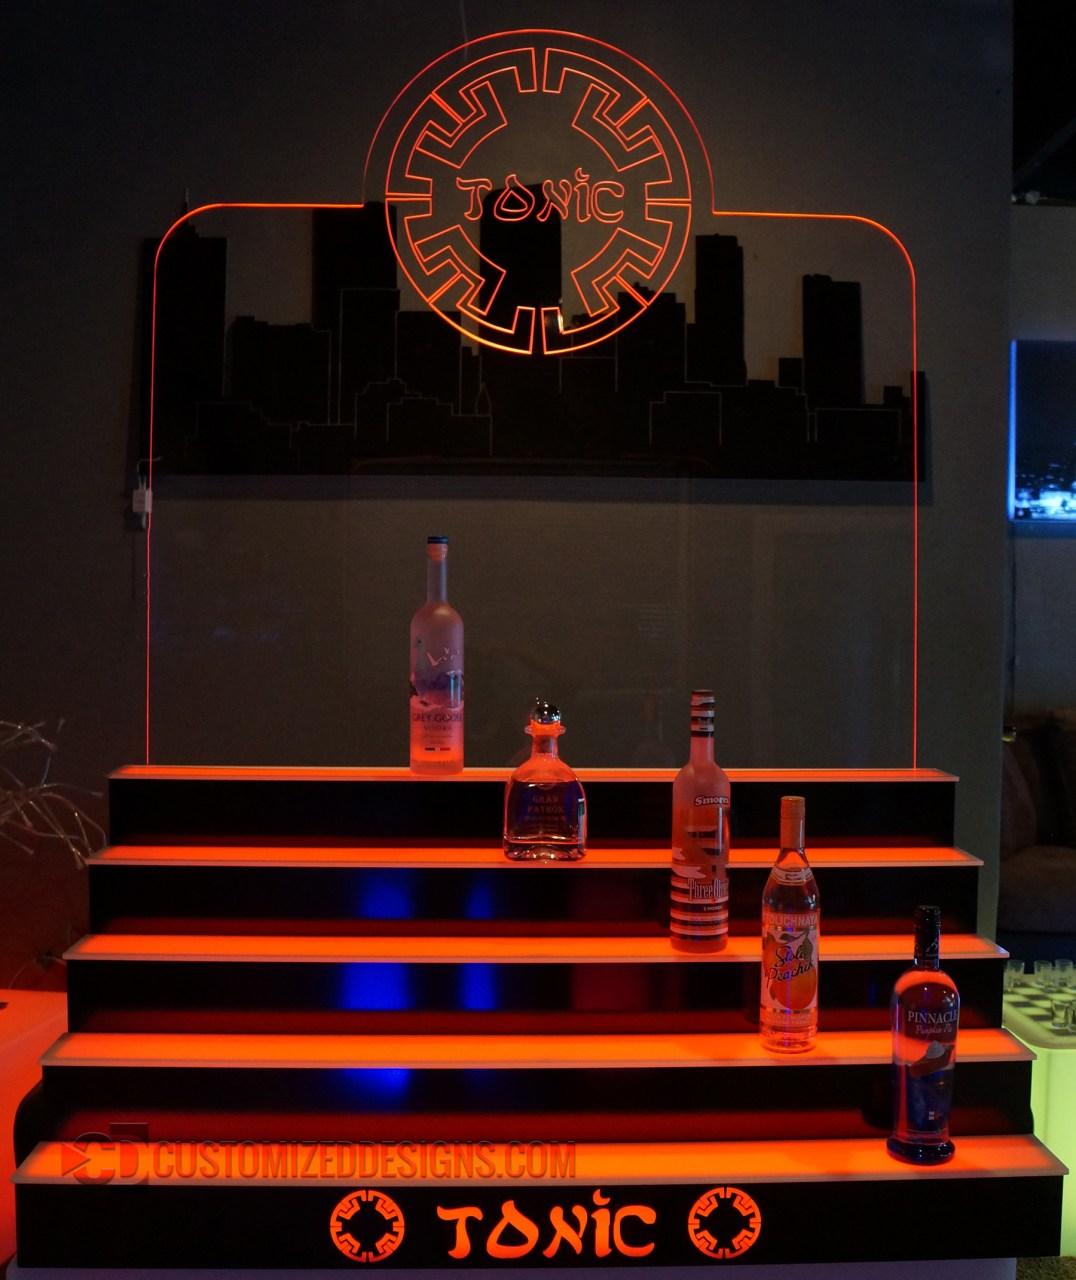 5 Tier Hookah Display w/ Edge Lit Panel